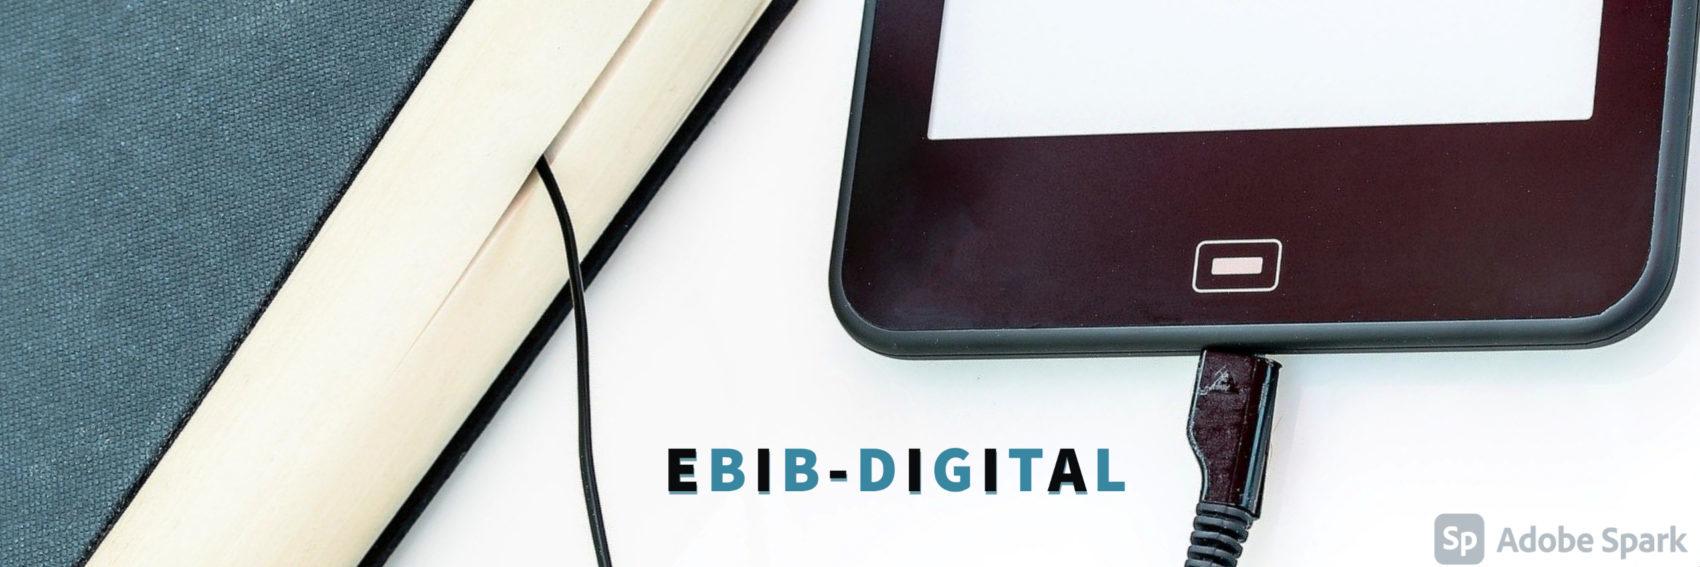 Ebib-Digital